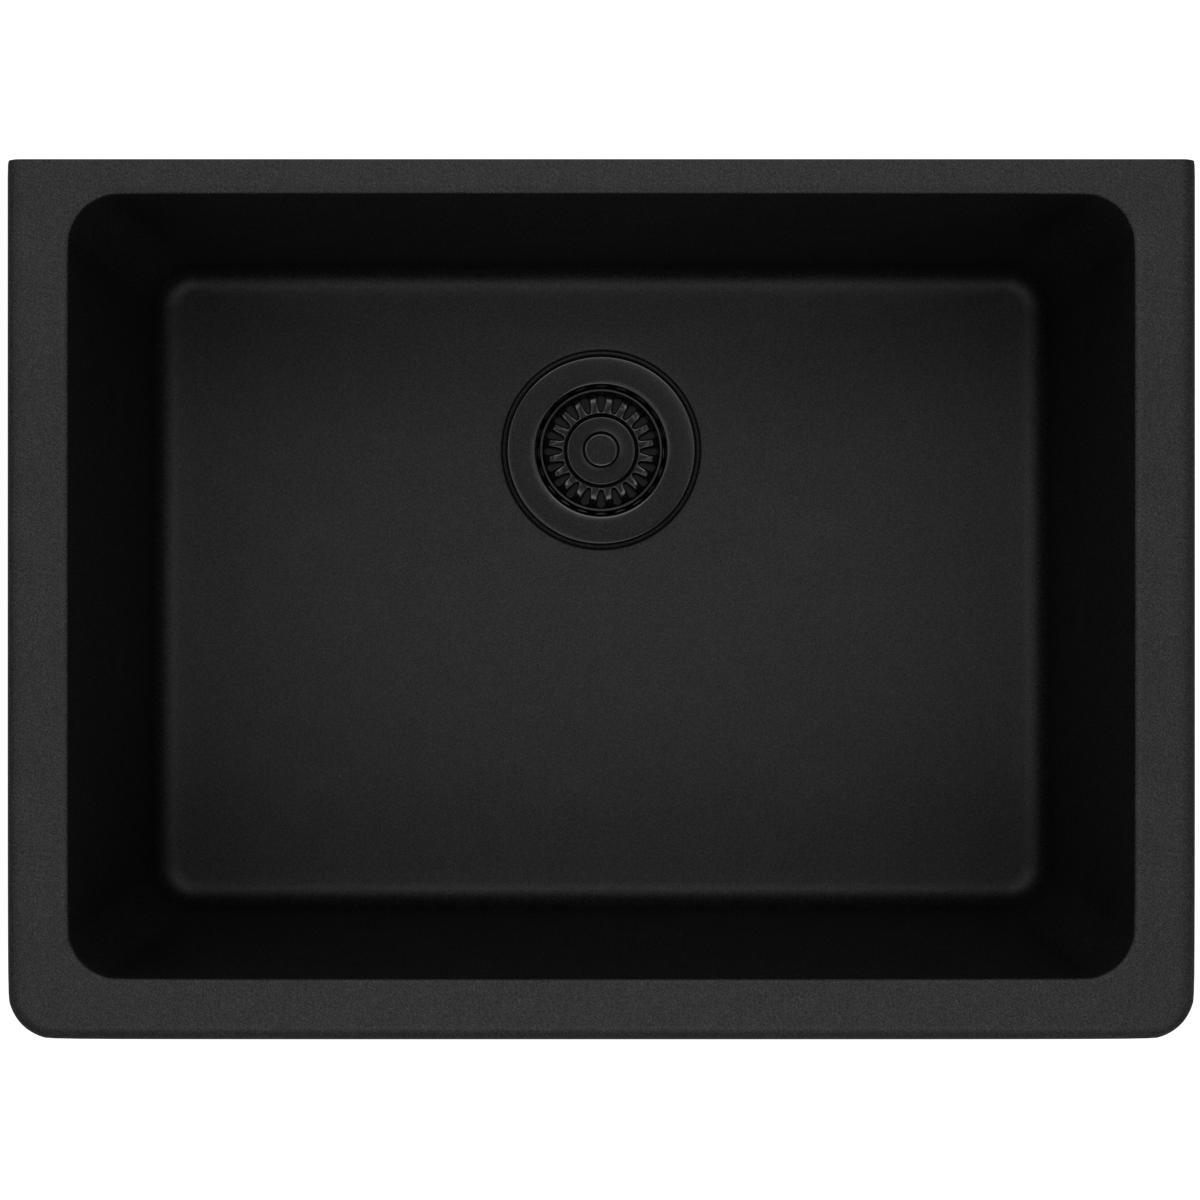 Elkay ELGU2522BK0 Gourmet Quartz Classic Undermount Sink, Black